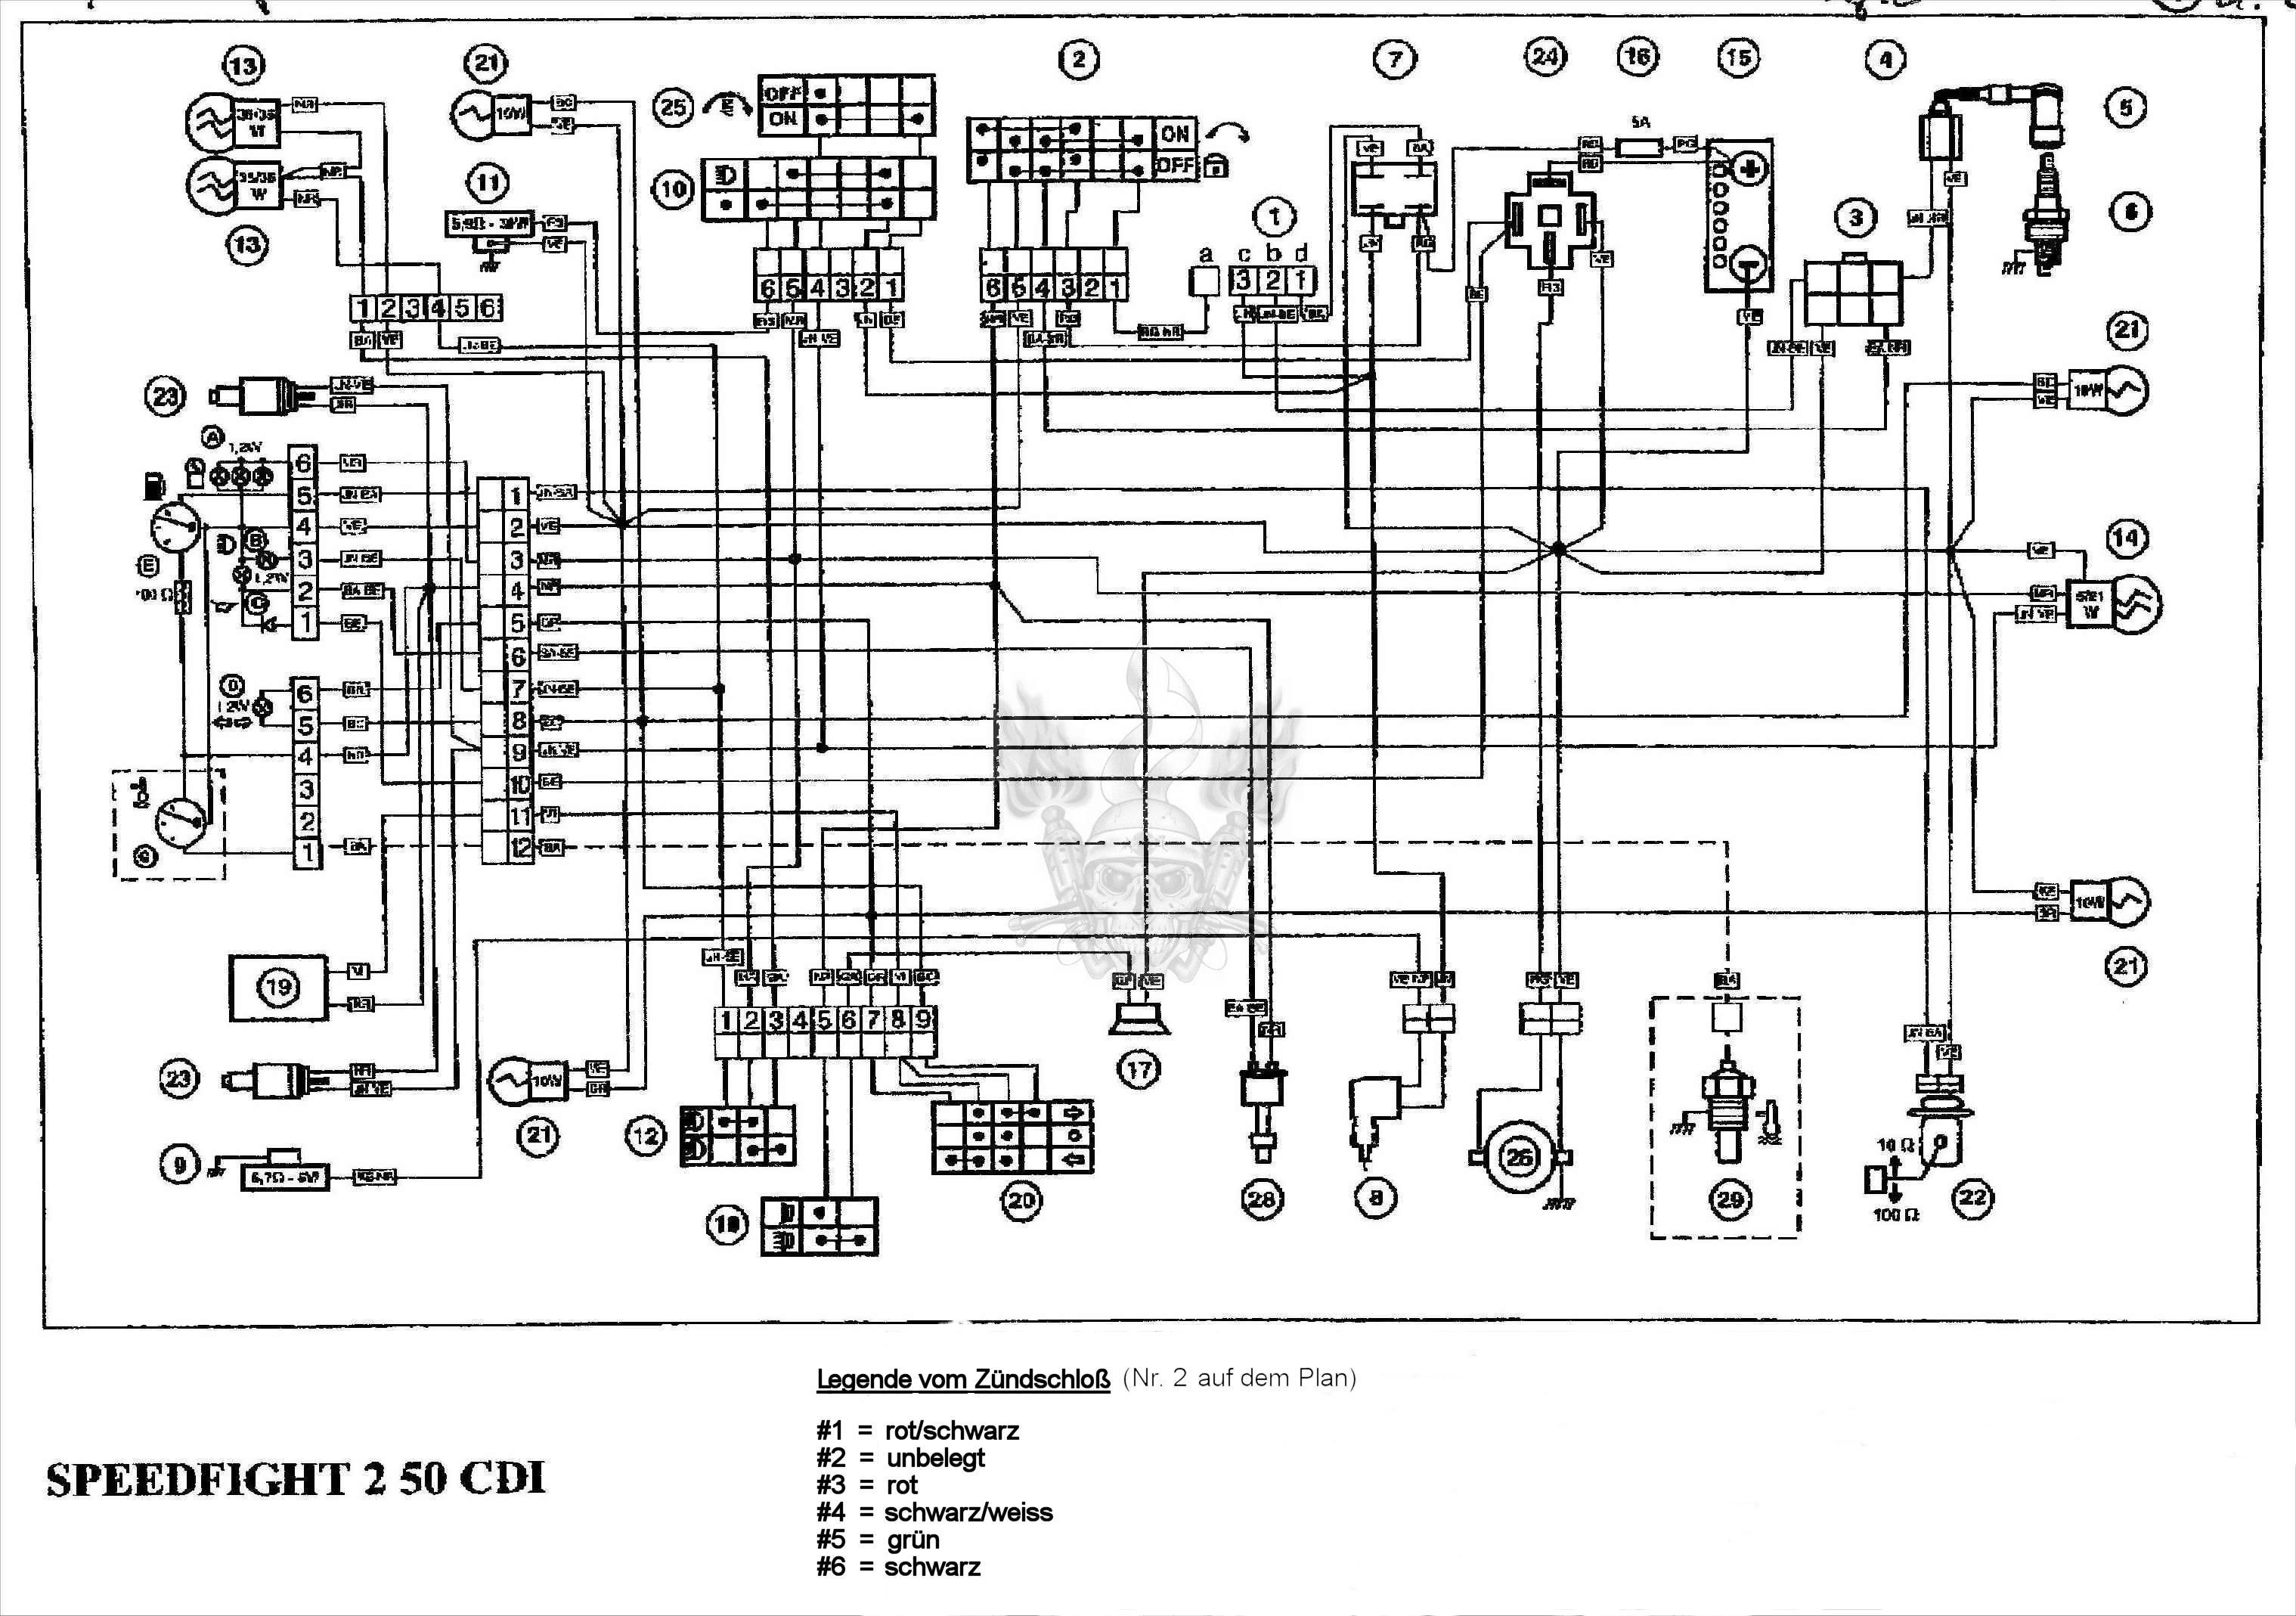 Jonway Scooter Wiring Harness | Wiring Diagram on gy6 wiring harness diagram, 49cc scooter carburetor diagram, 49cc scooter wiring diagram 2004, 50cc gy6 diagram, 50cc scooter fuel line diagram, gy6 cdi wiring diagram, 49cc carburetor 139qmb diagram, chinese scooter carburetor diagram, gy6 150cc vacuum line diagram, 50cc carburetor diagram, gy6 regulator wiring diagram, gy6 150cc engine diagram, 50cc scooter engine diagram, jonway 49cc scooter diagram,